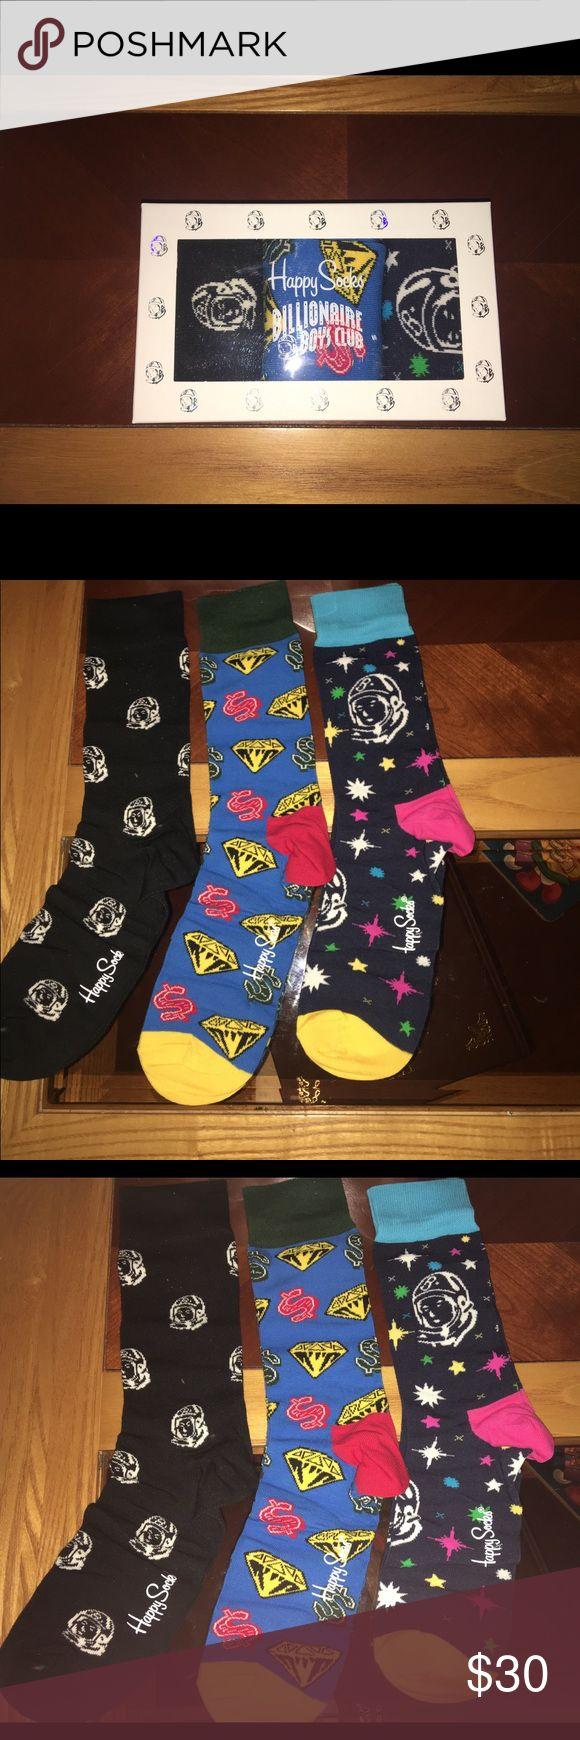 Happy Socks x Billionaire Boys Club box set Happy socks x Billionaire Boys Club 3pair socks box set. 10-13 sock size =Men's 8-12 Ladies 10-12.5 comb cotton blend Happy Socks Accessories Hosiery & Socks